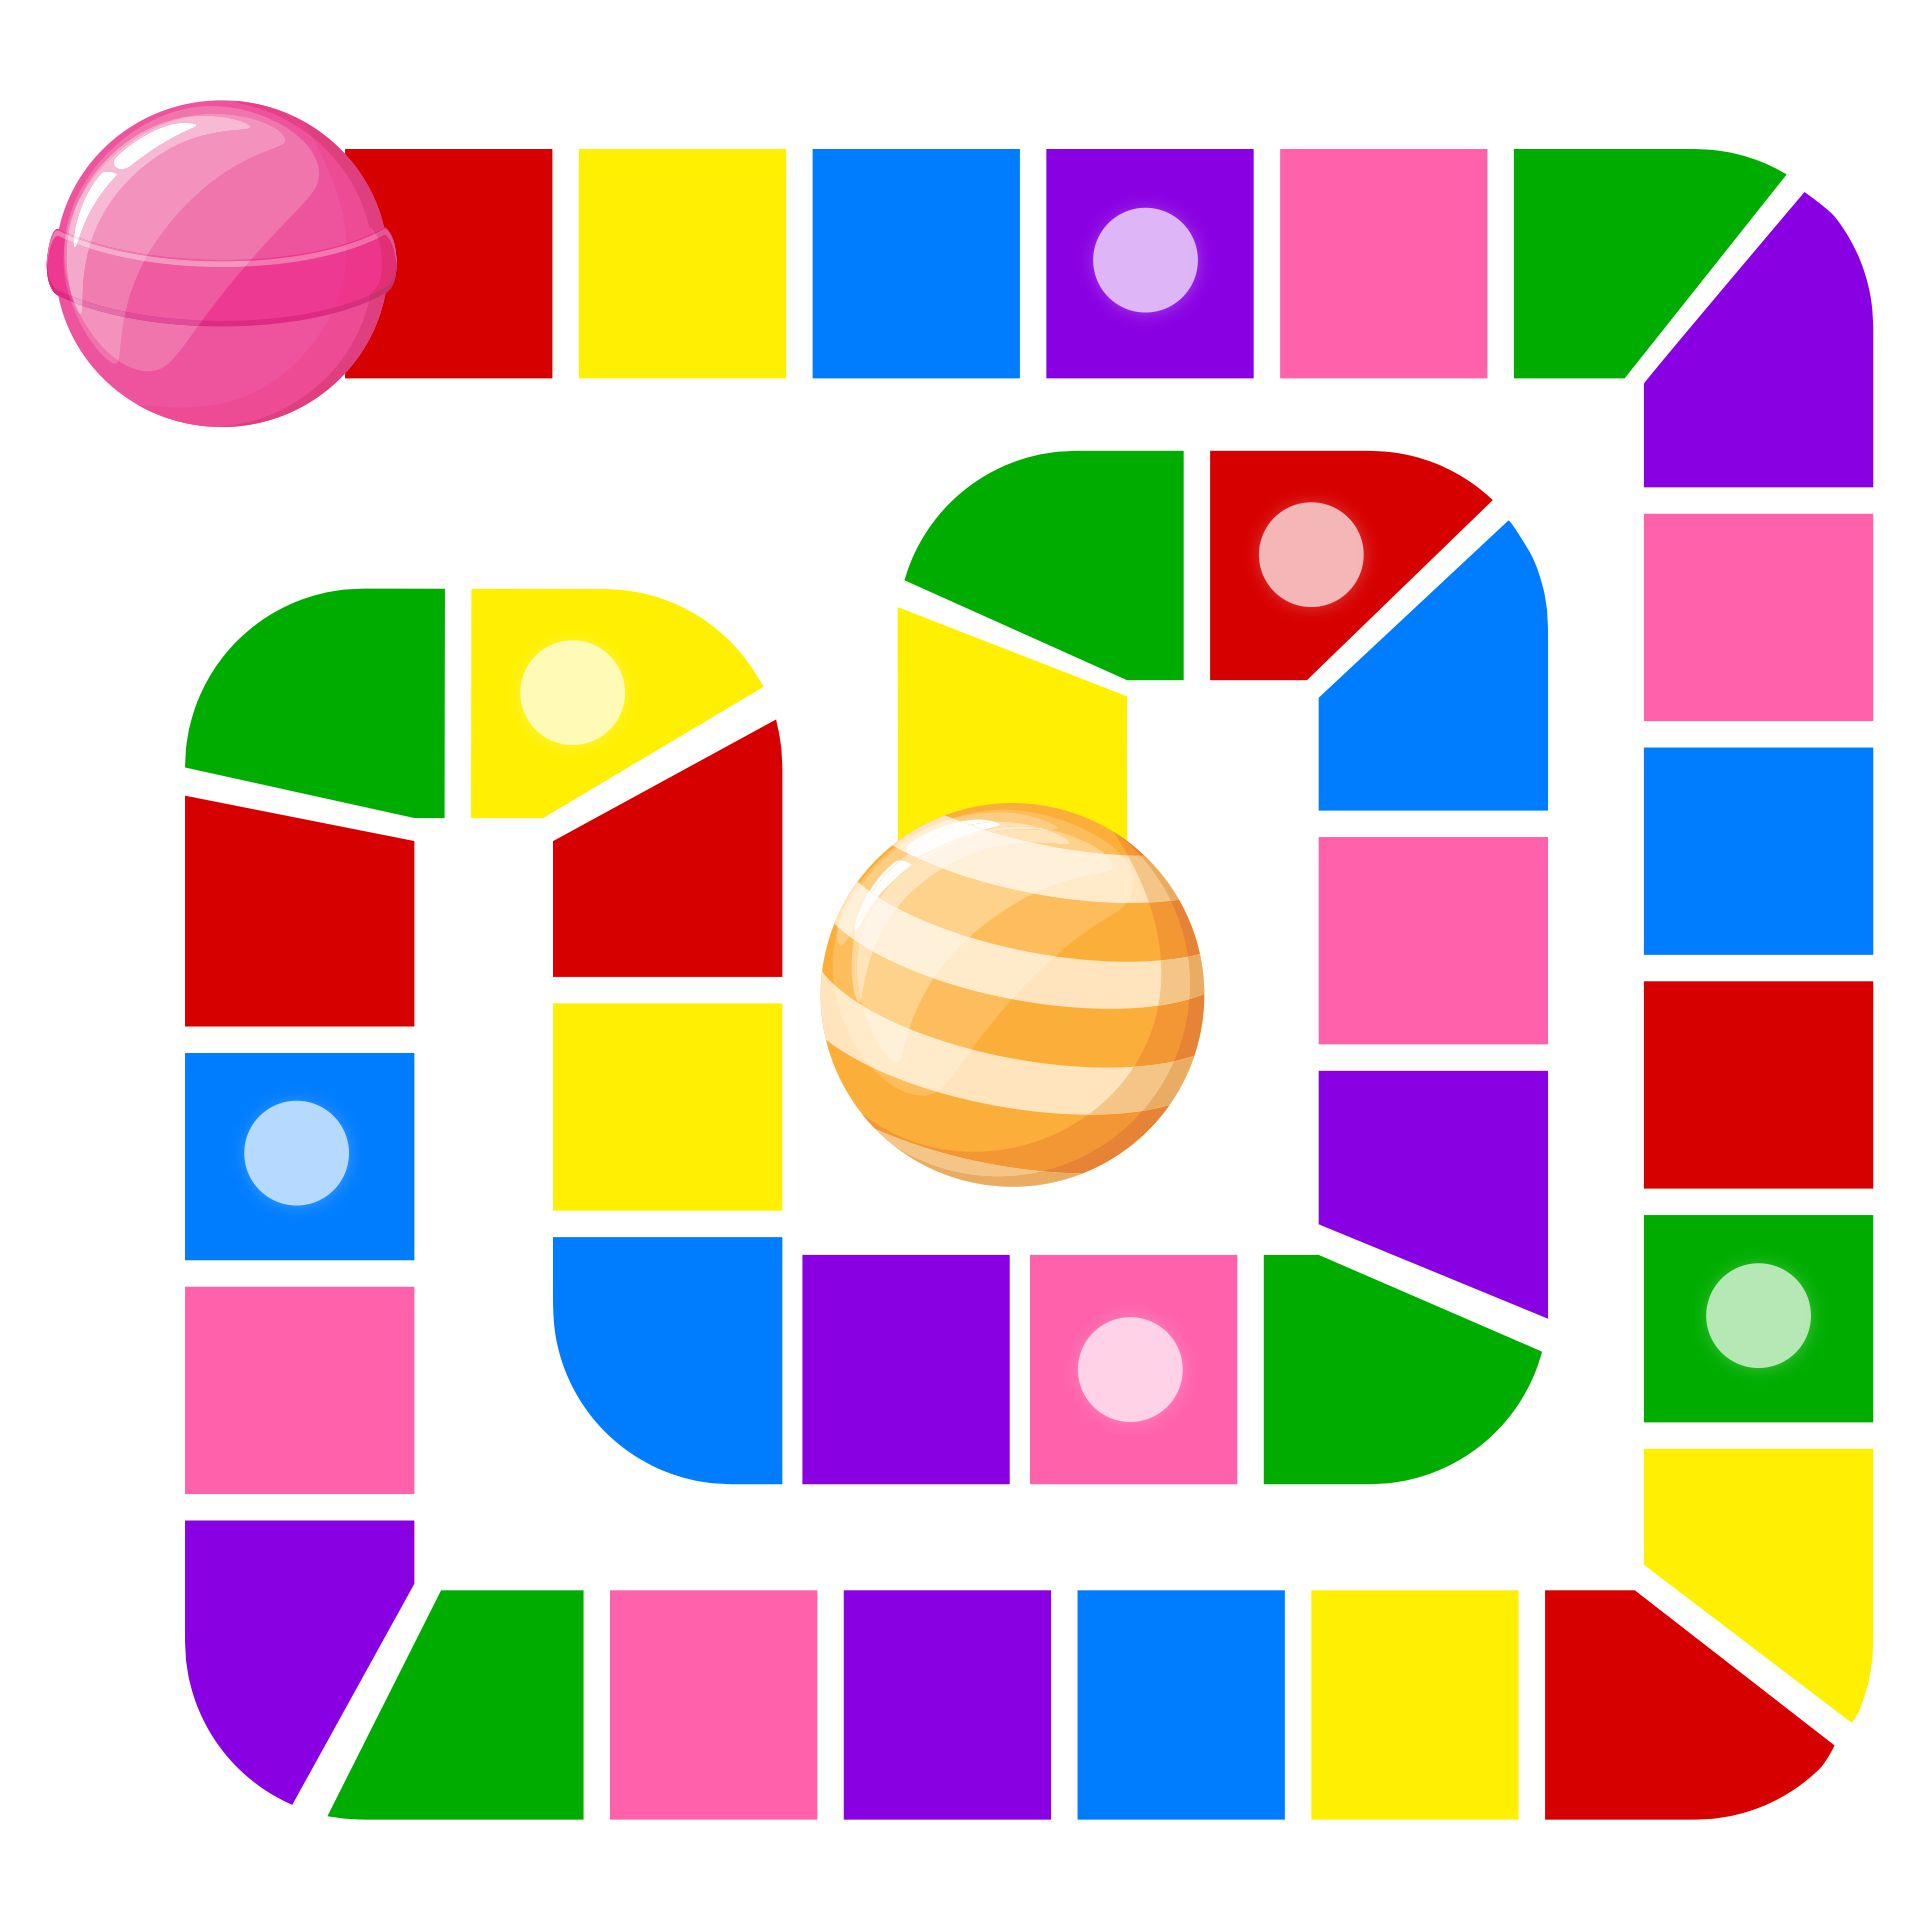 Blank Candyland Game Board